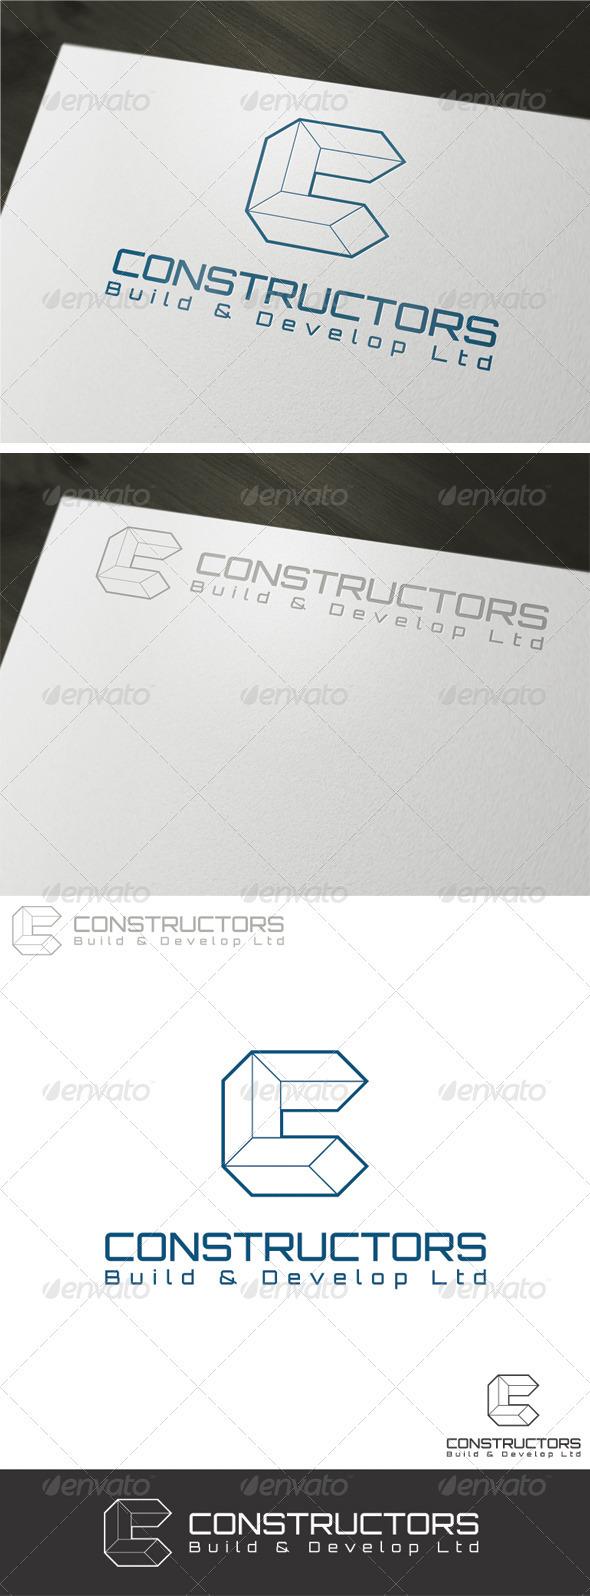 Constructors Logo Template - Vector Abstract